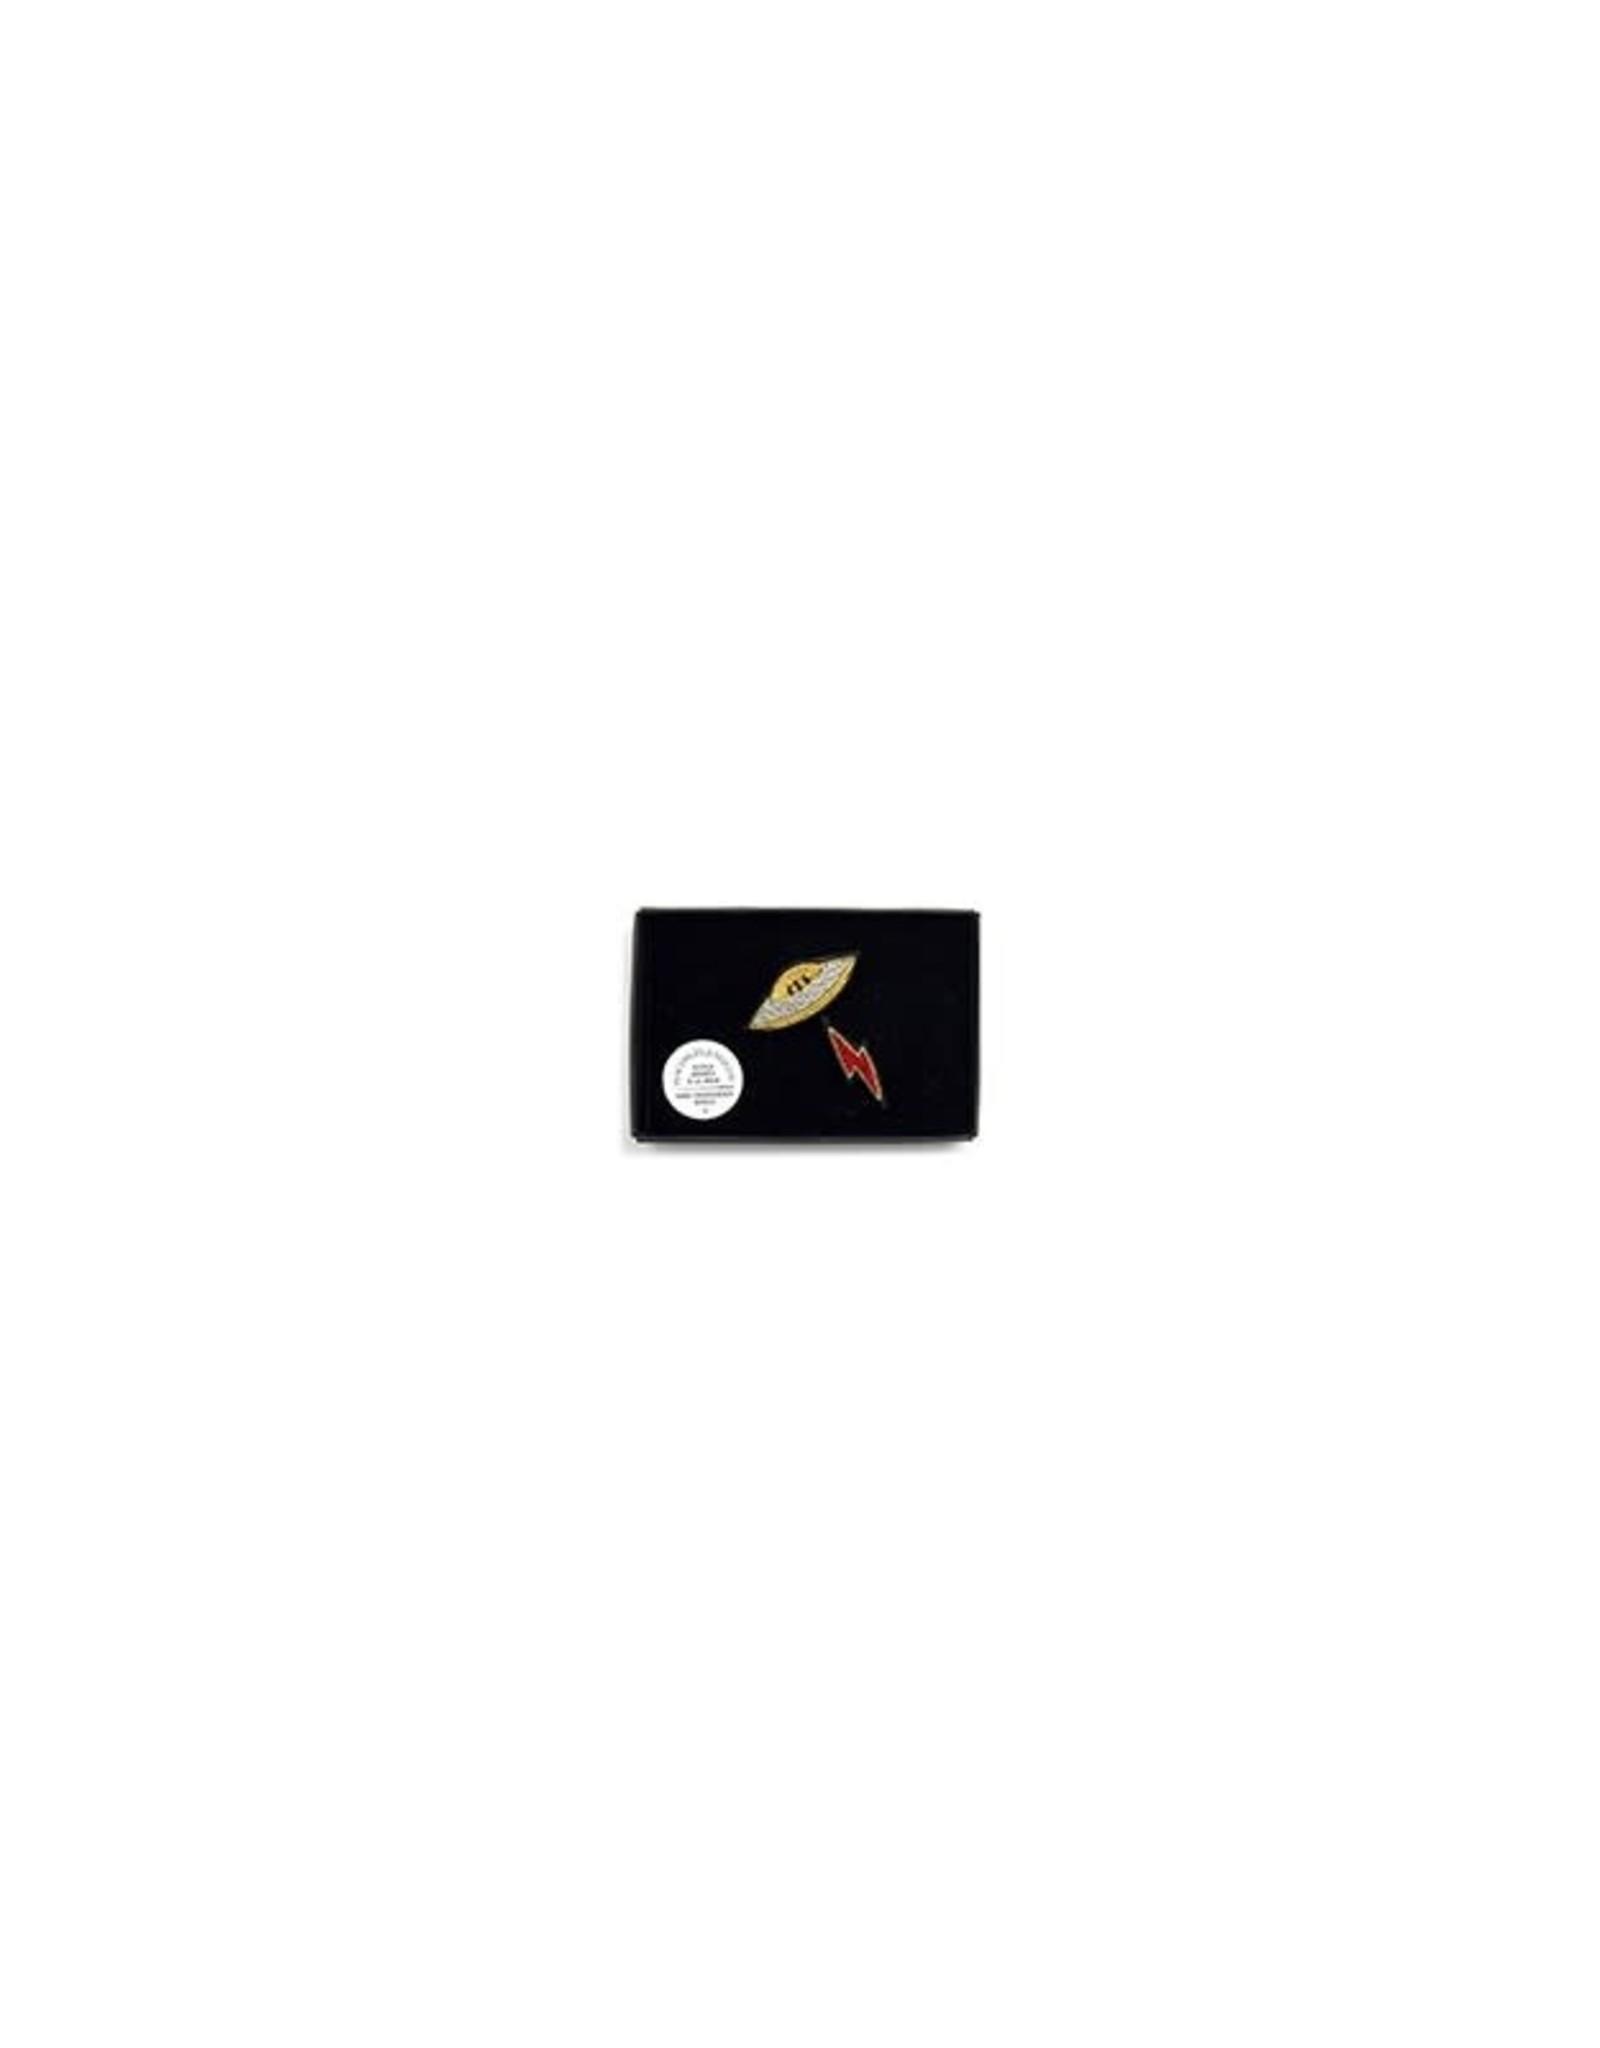 Macon & Lesquoy 'UFO' Pin